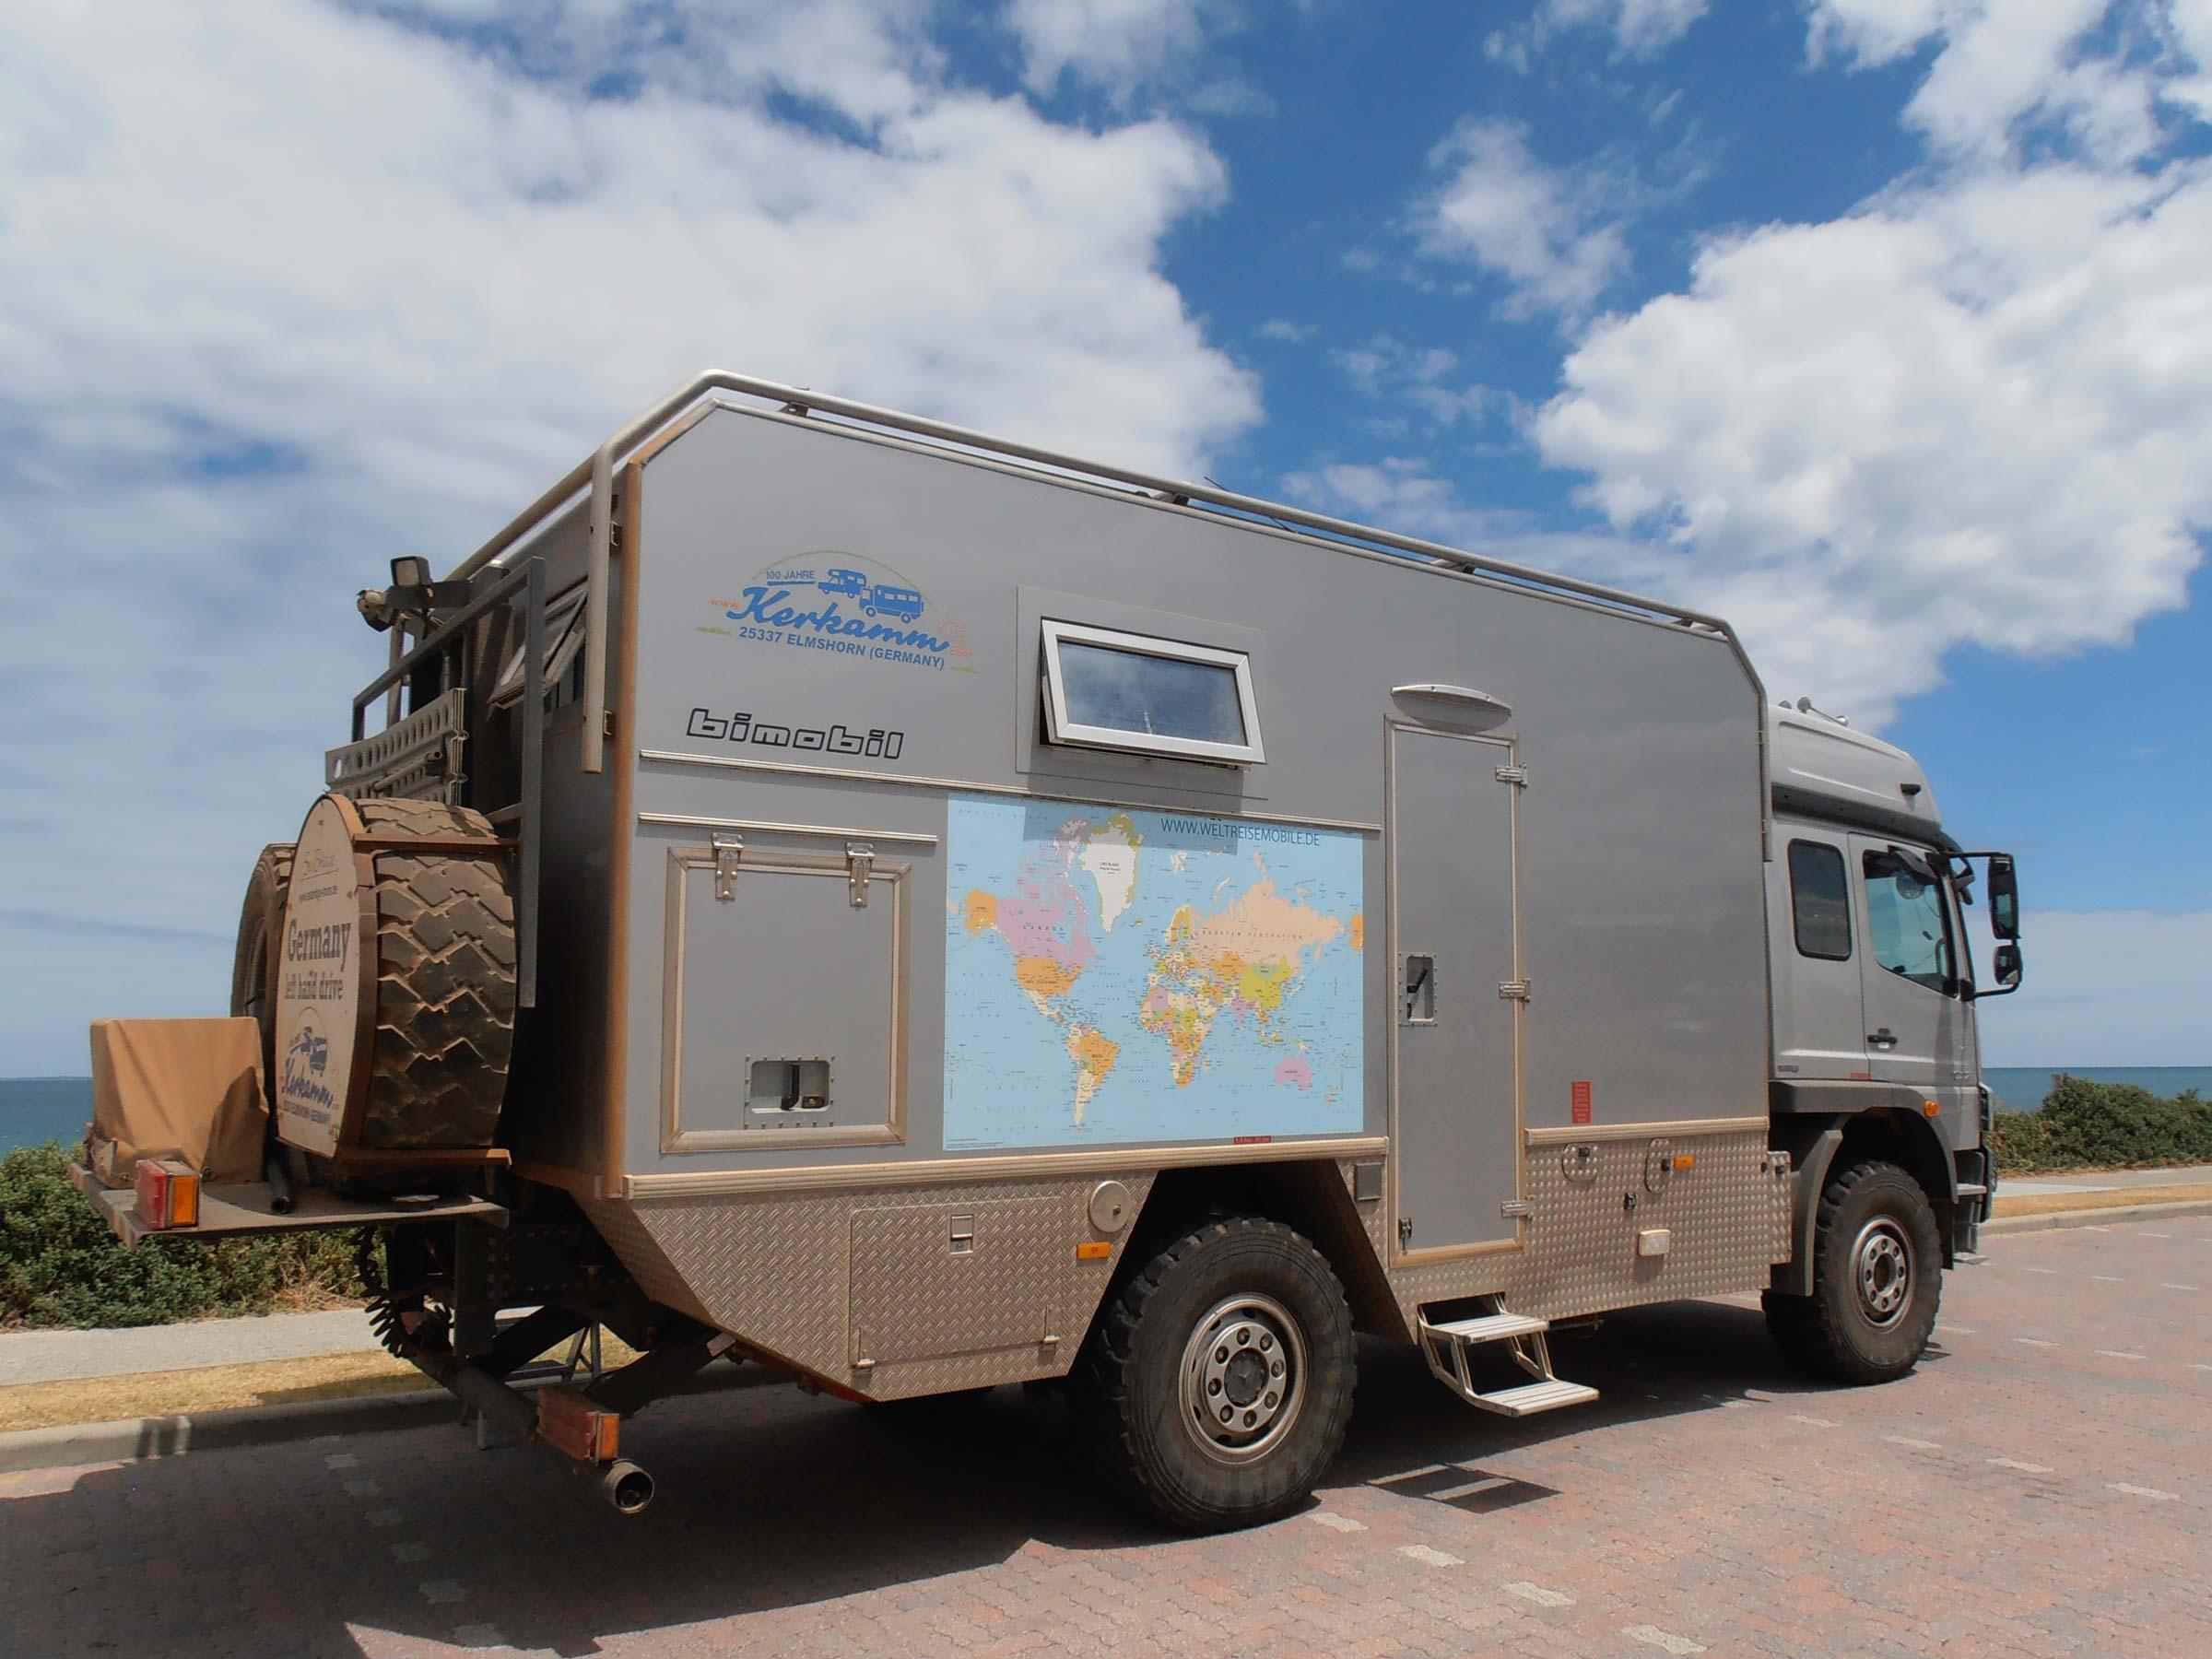 Kerkamm 10 tonne vehicle